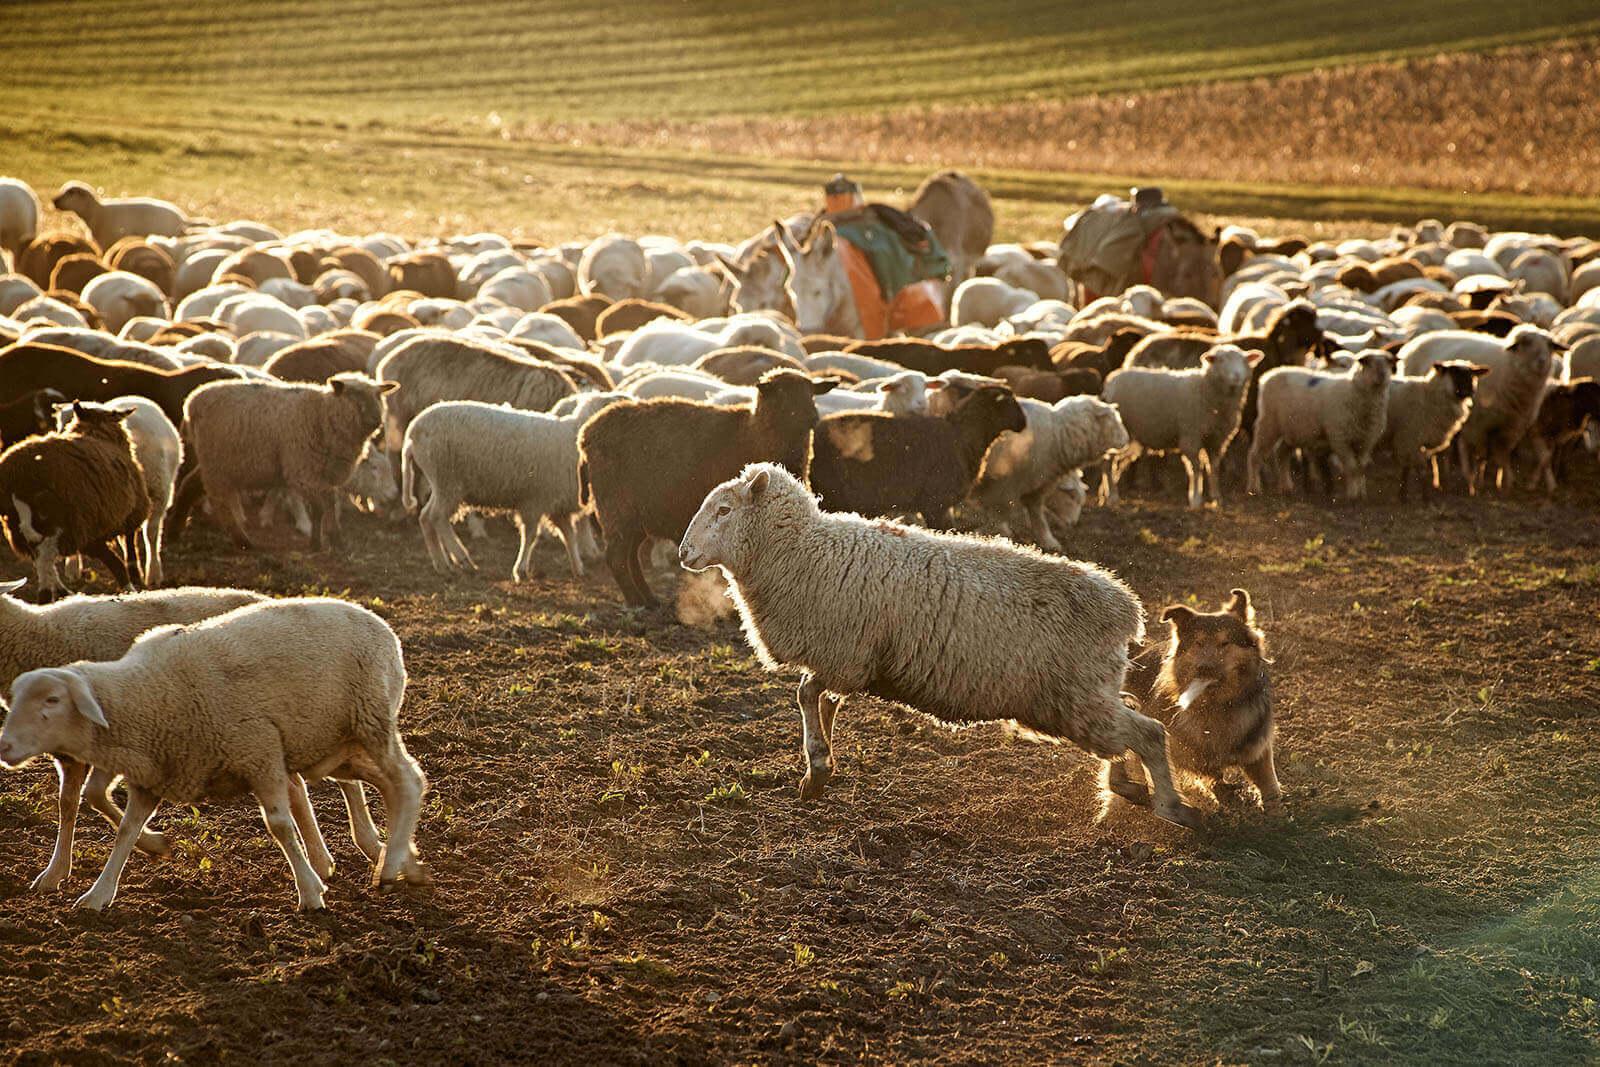 Landwirt_Rudy_Canonica_4238.jpg